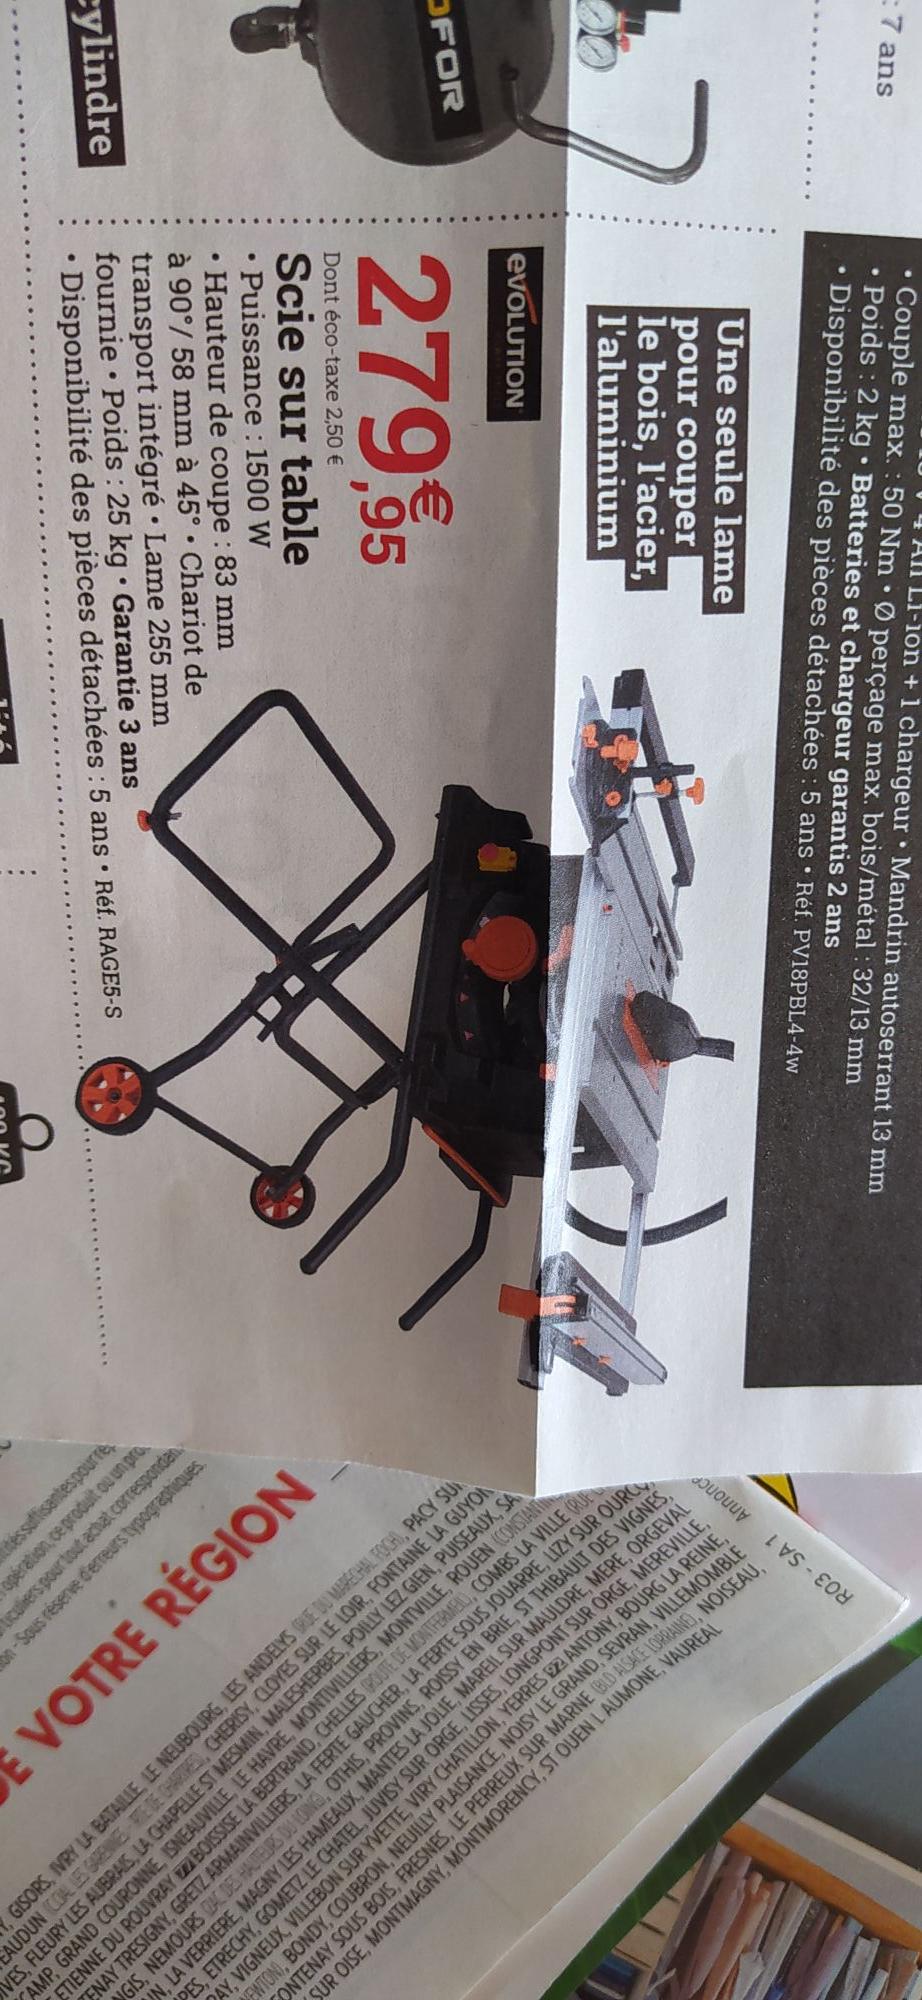 Scie sur table Evolution Rage5-S 1500w - Espace Emeraude